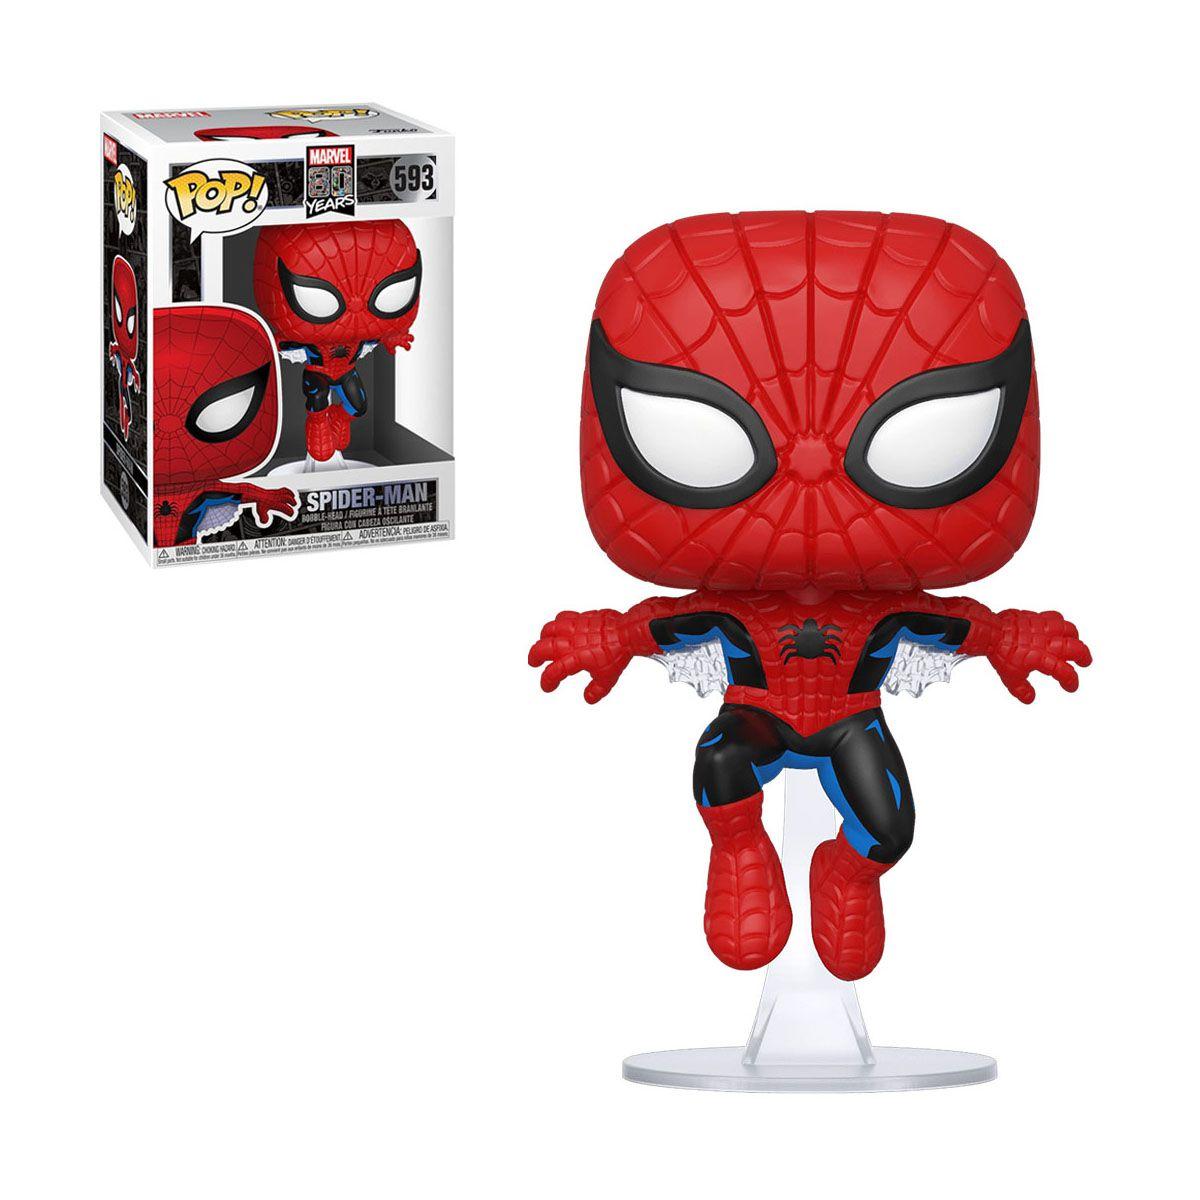 Funko Pop Homem Aranha 593 Spider-Man Marvel 80 Years